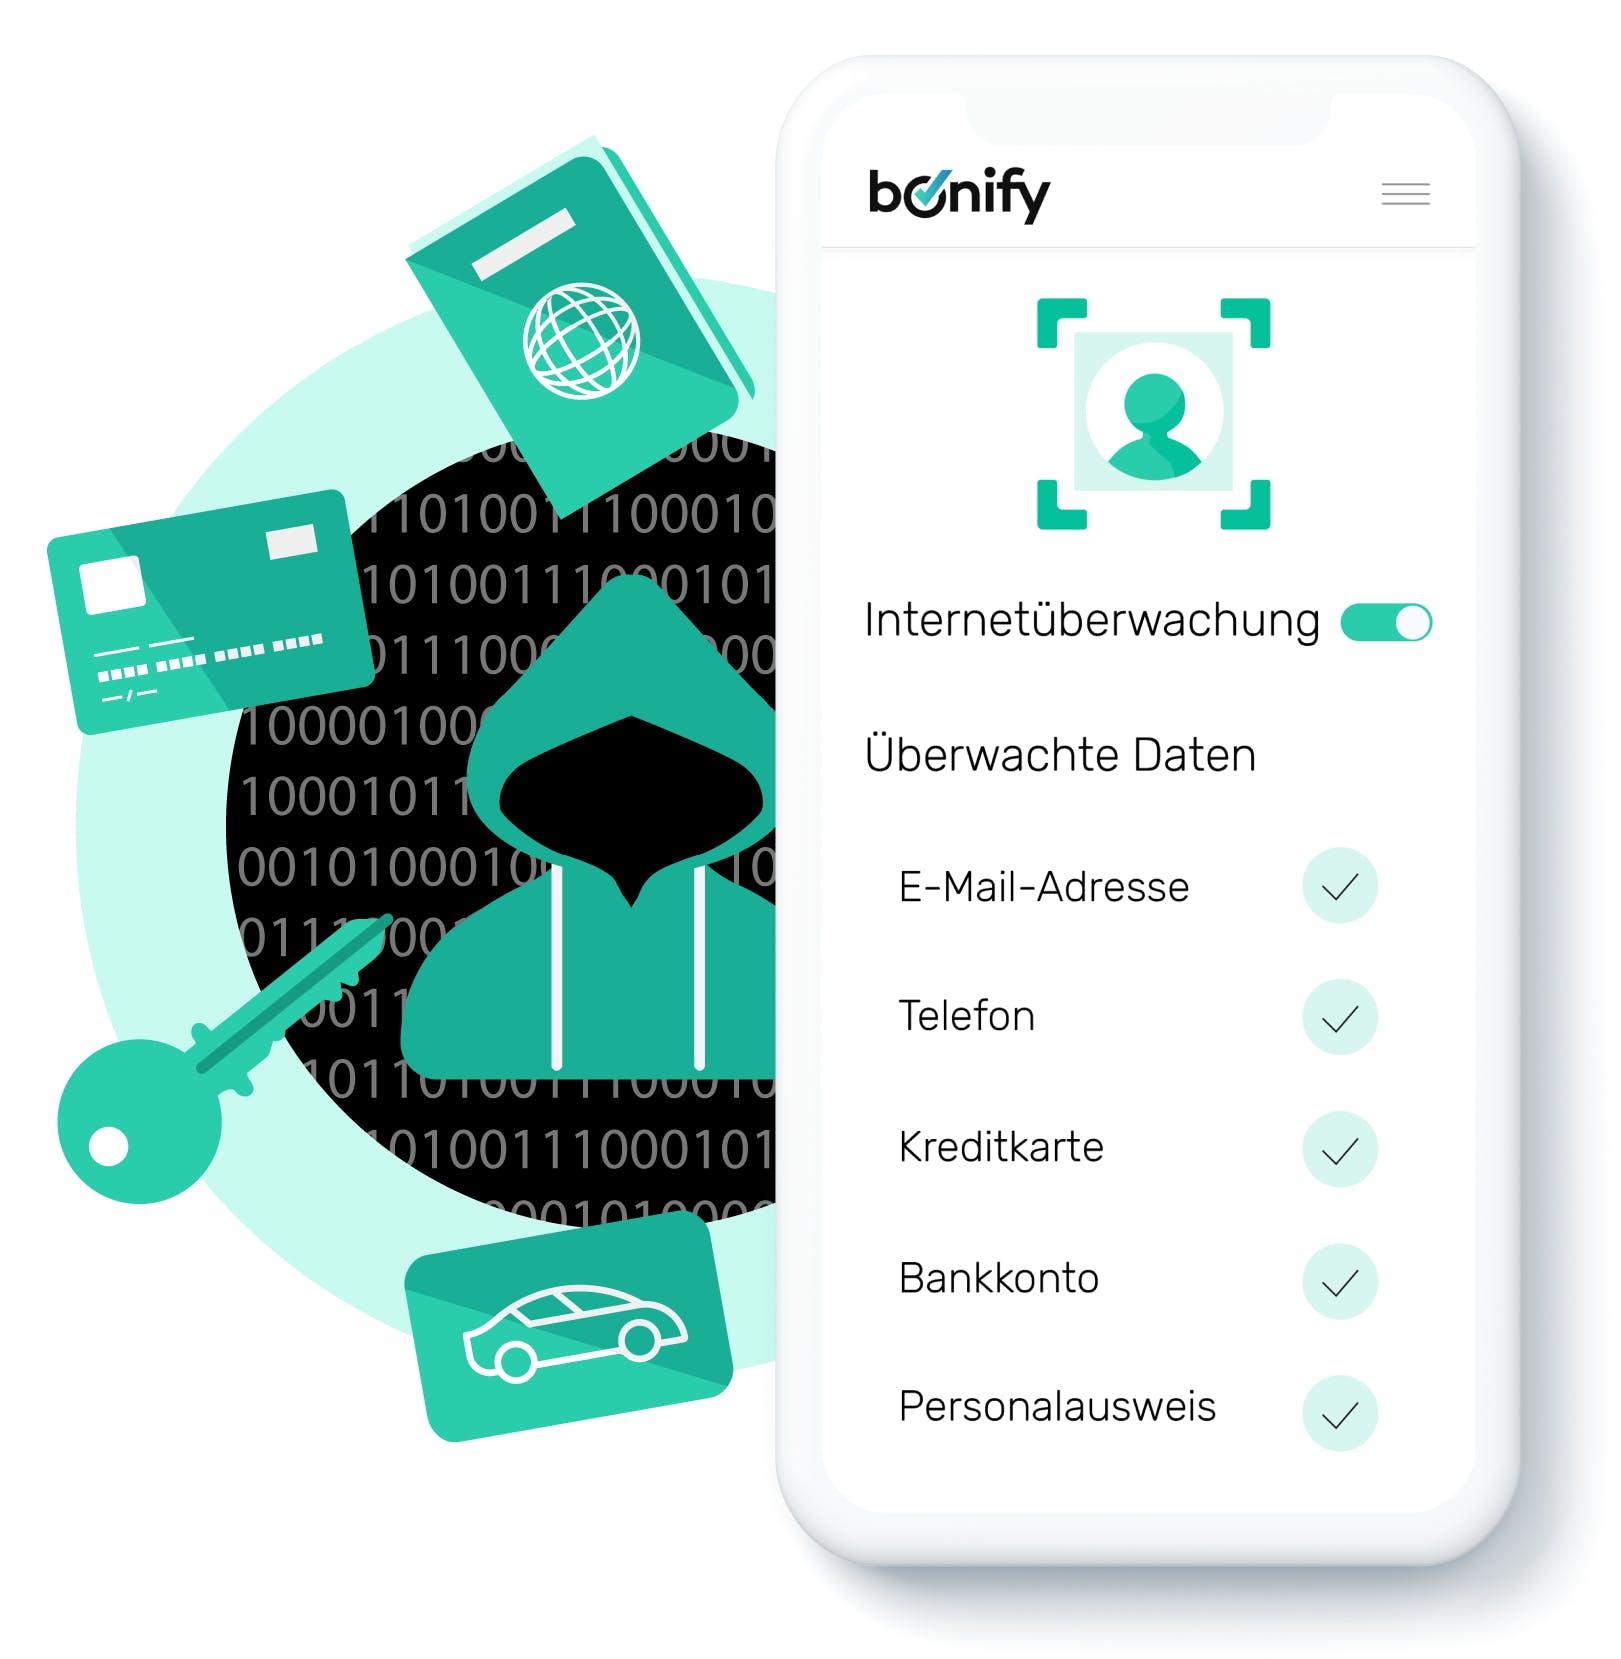 bonify IdentProtect